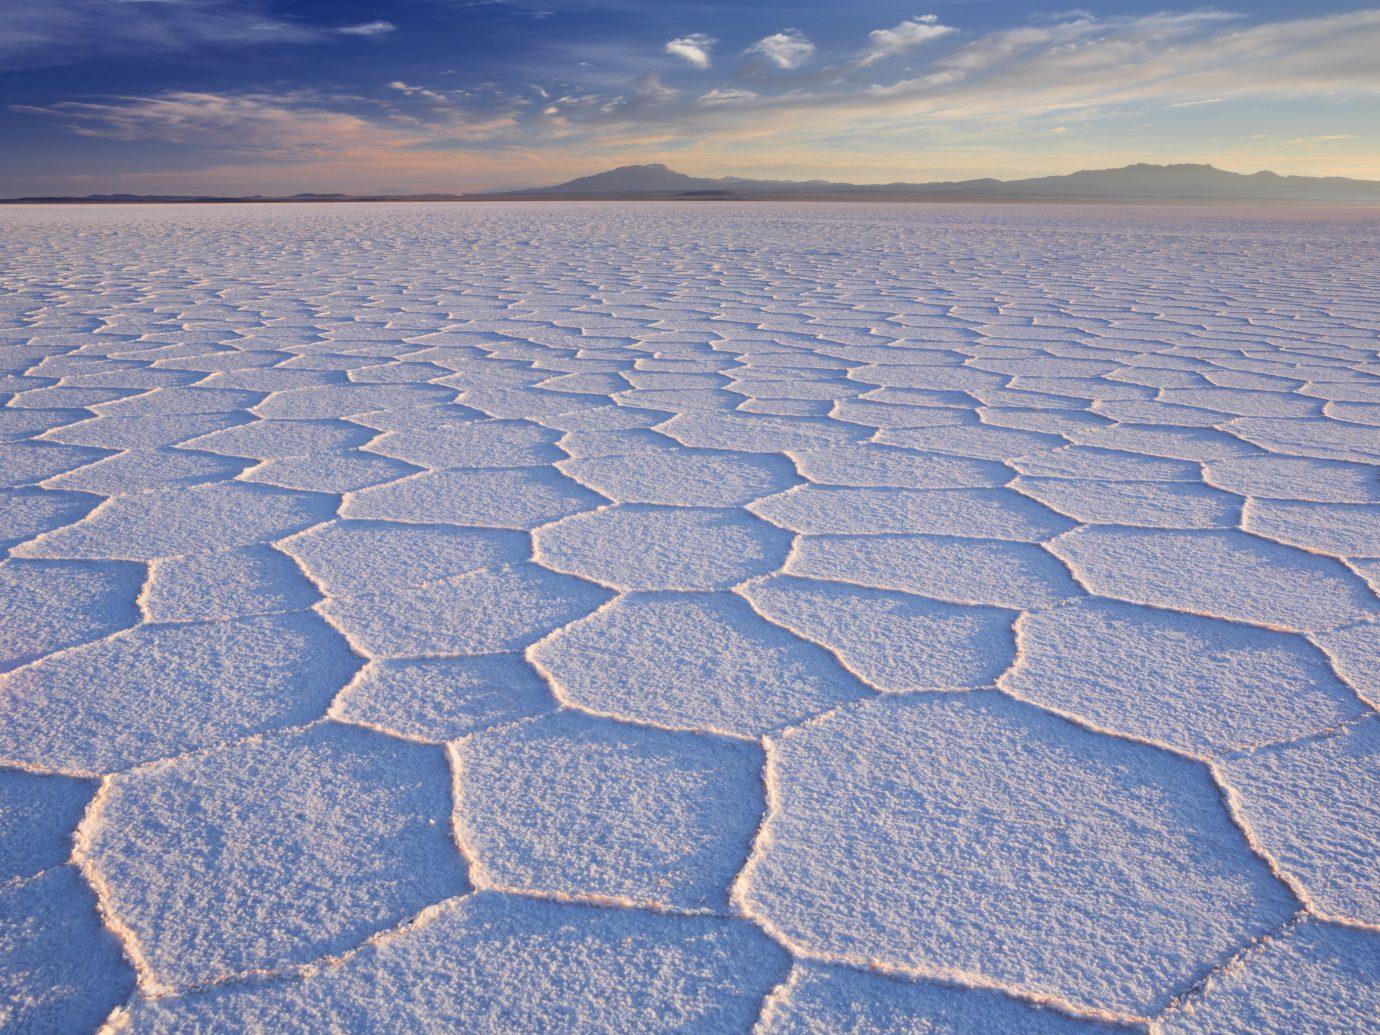 Trip Ideas sky outdoor horizon natural environment ecosystem road surface Sea plain mudflat sand soil Nature sunlight tundra arctic ocean frost salt evaporation pond salt lake arctic paving